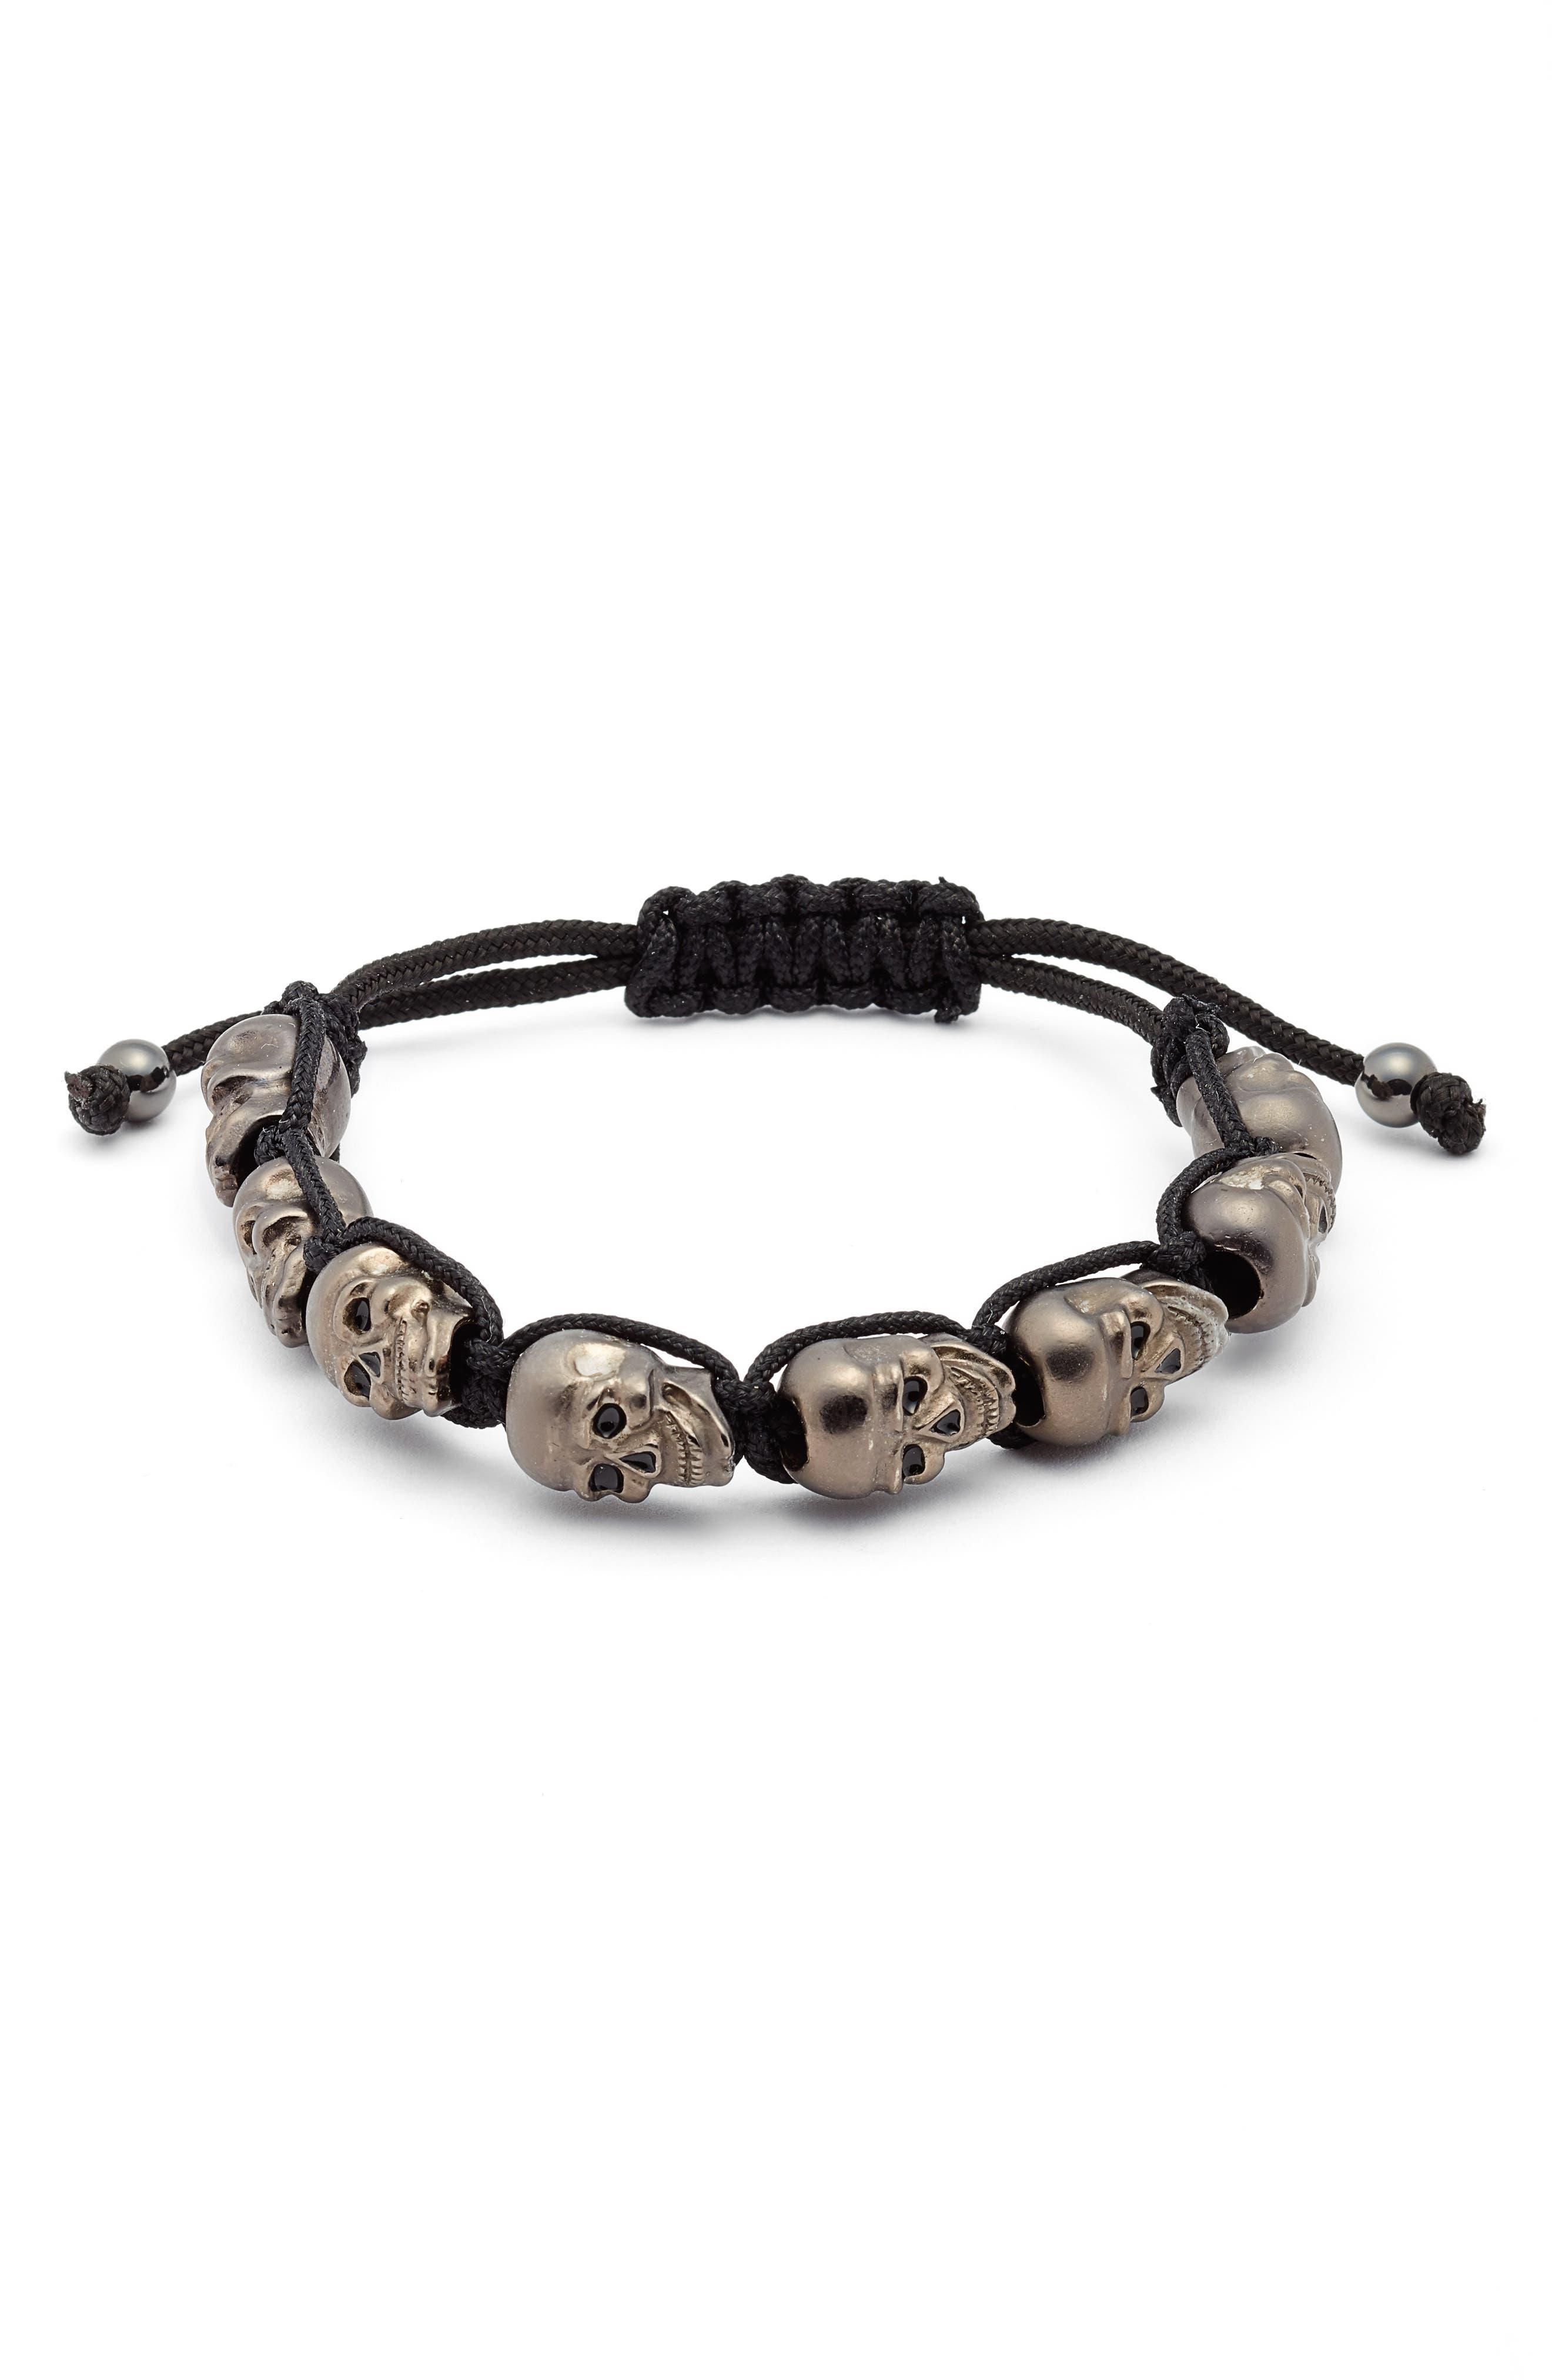 Skulls Adjustable Shambala Bracelet,                             Main thumbnail 1, color,                             Hematite